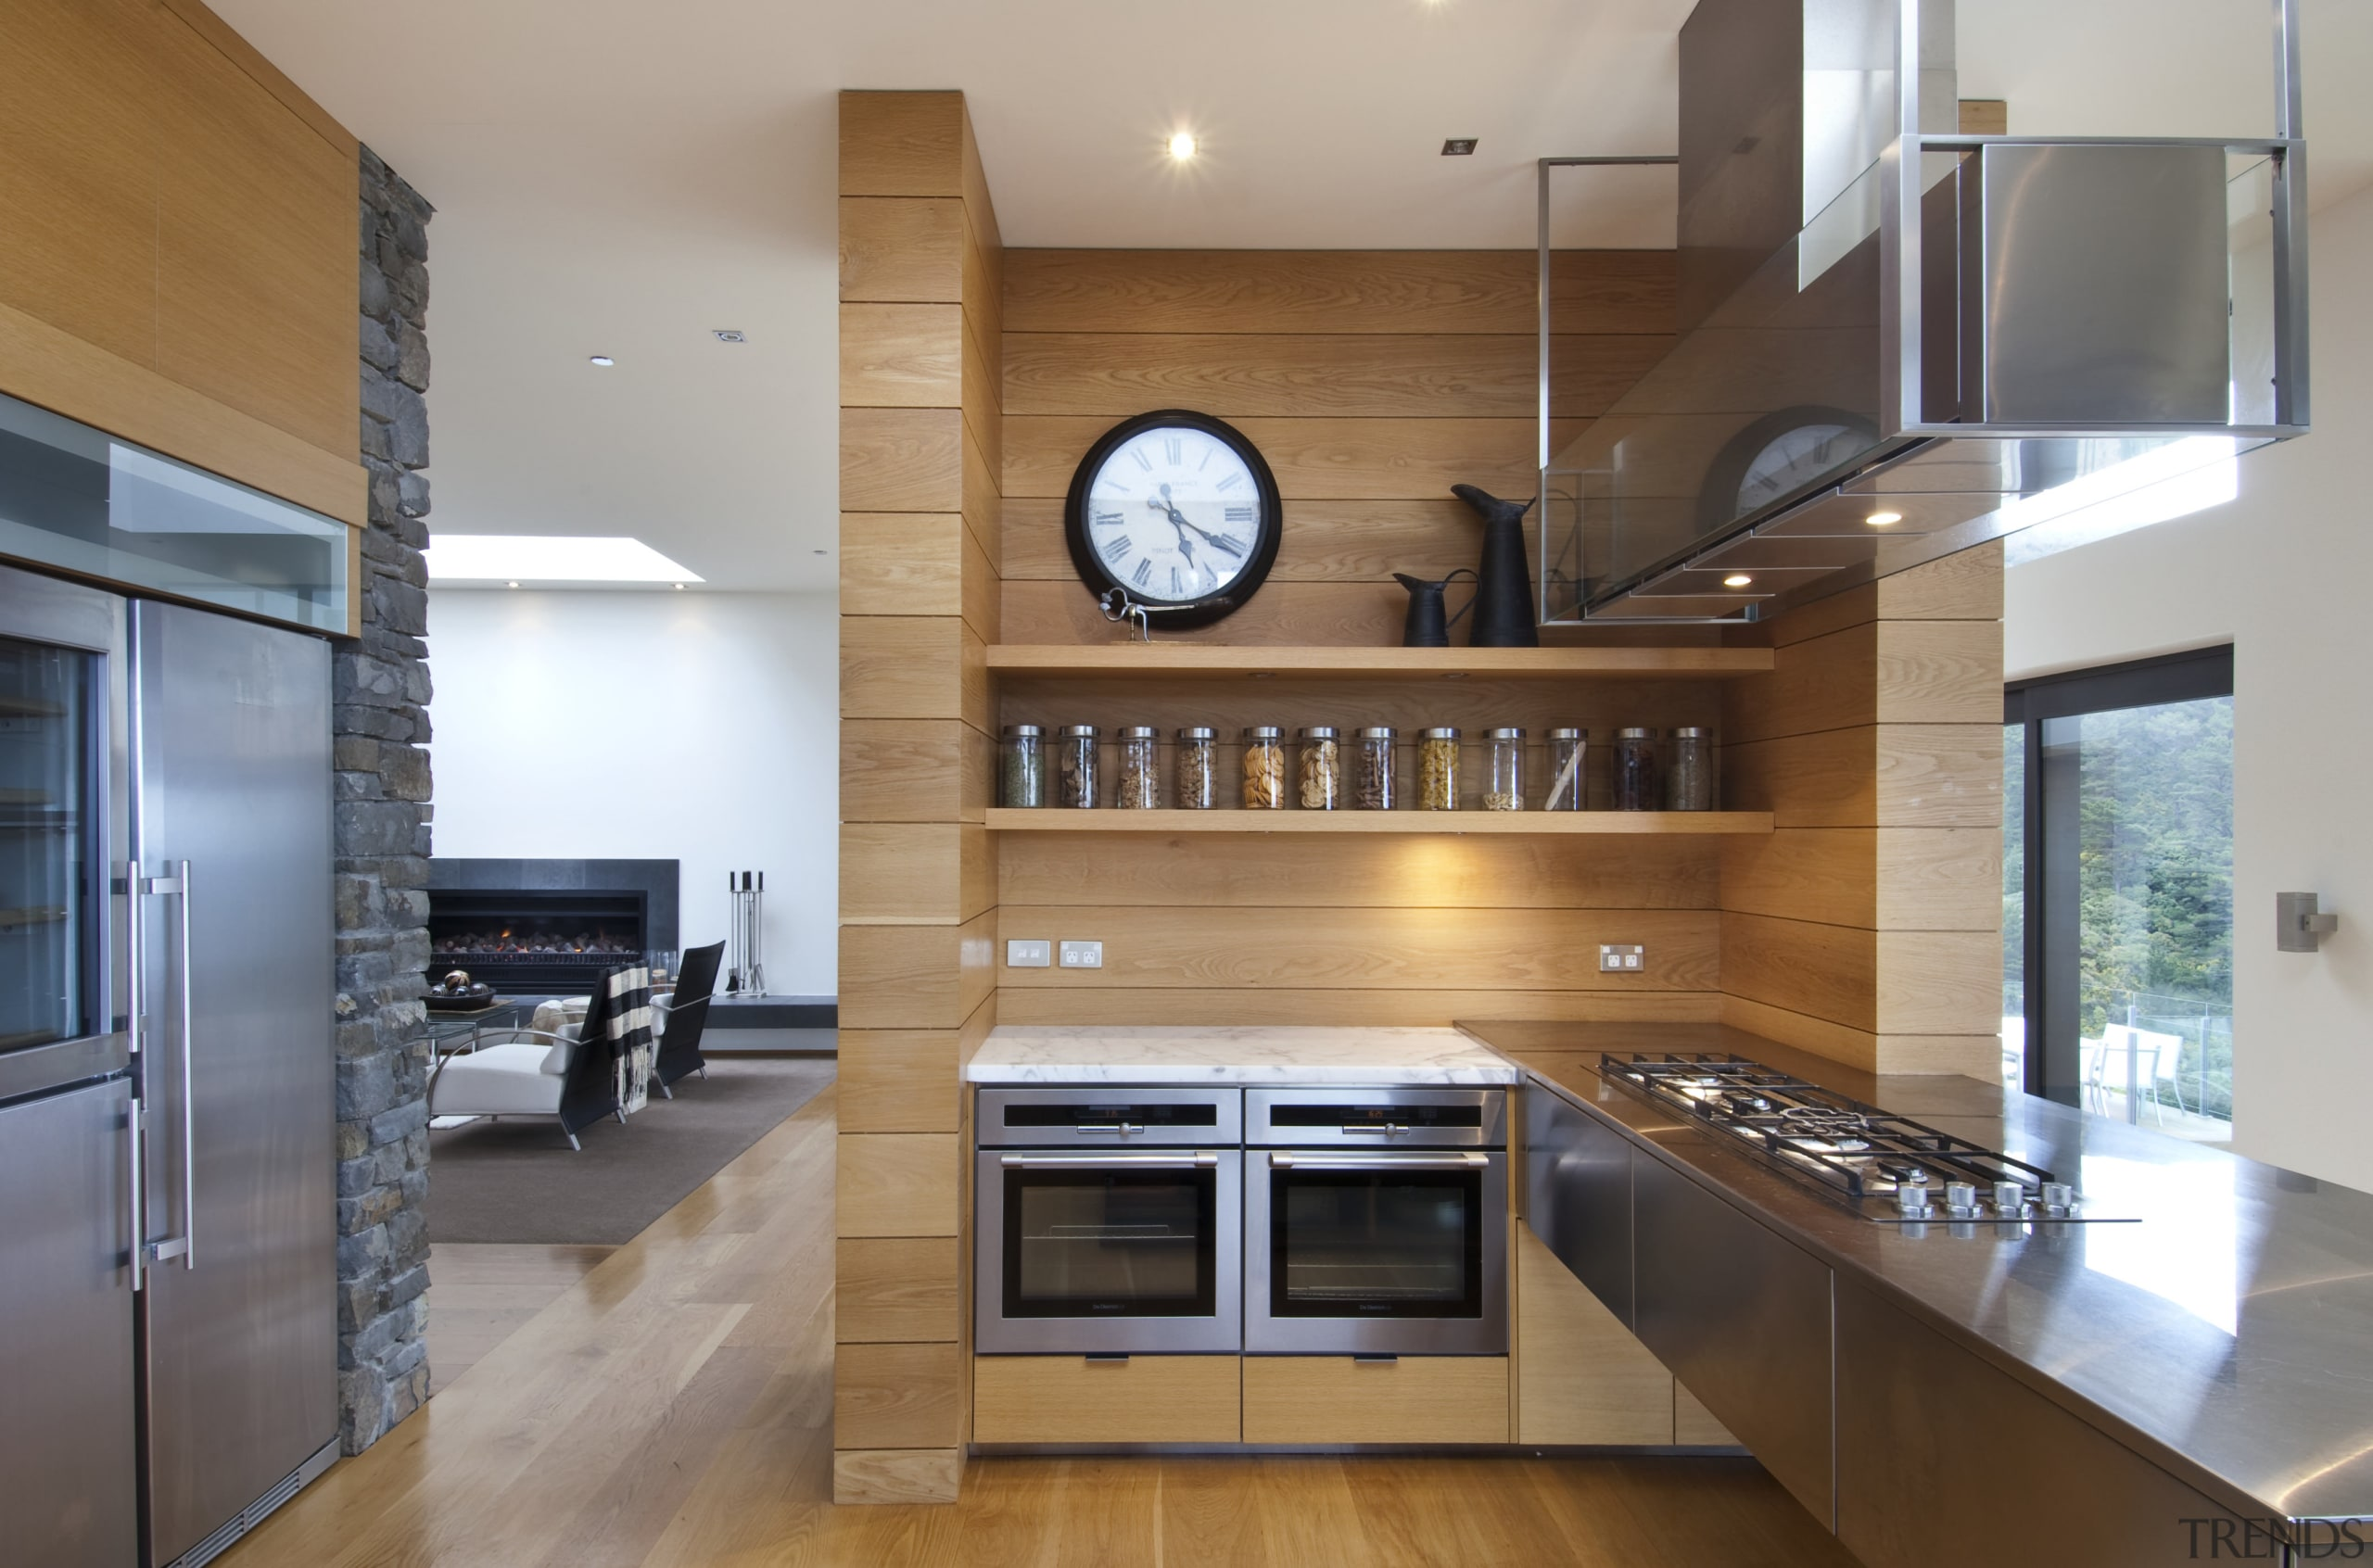 Raised floor kitchen. Stainless steel Binova cooktop. American cabinetry, countertop, cuisine classique, flooring, hardwood, interior design, kitchen, real estate, wood flooring, gray, brown